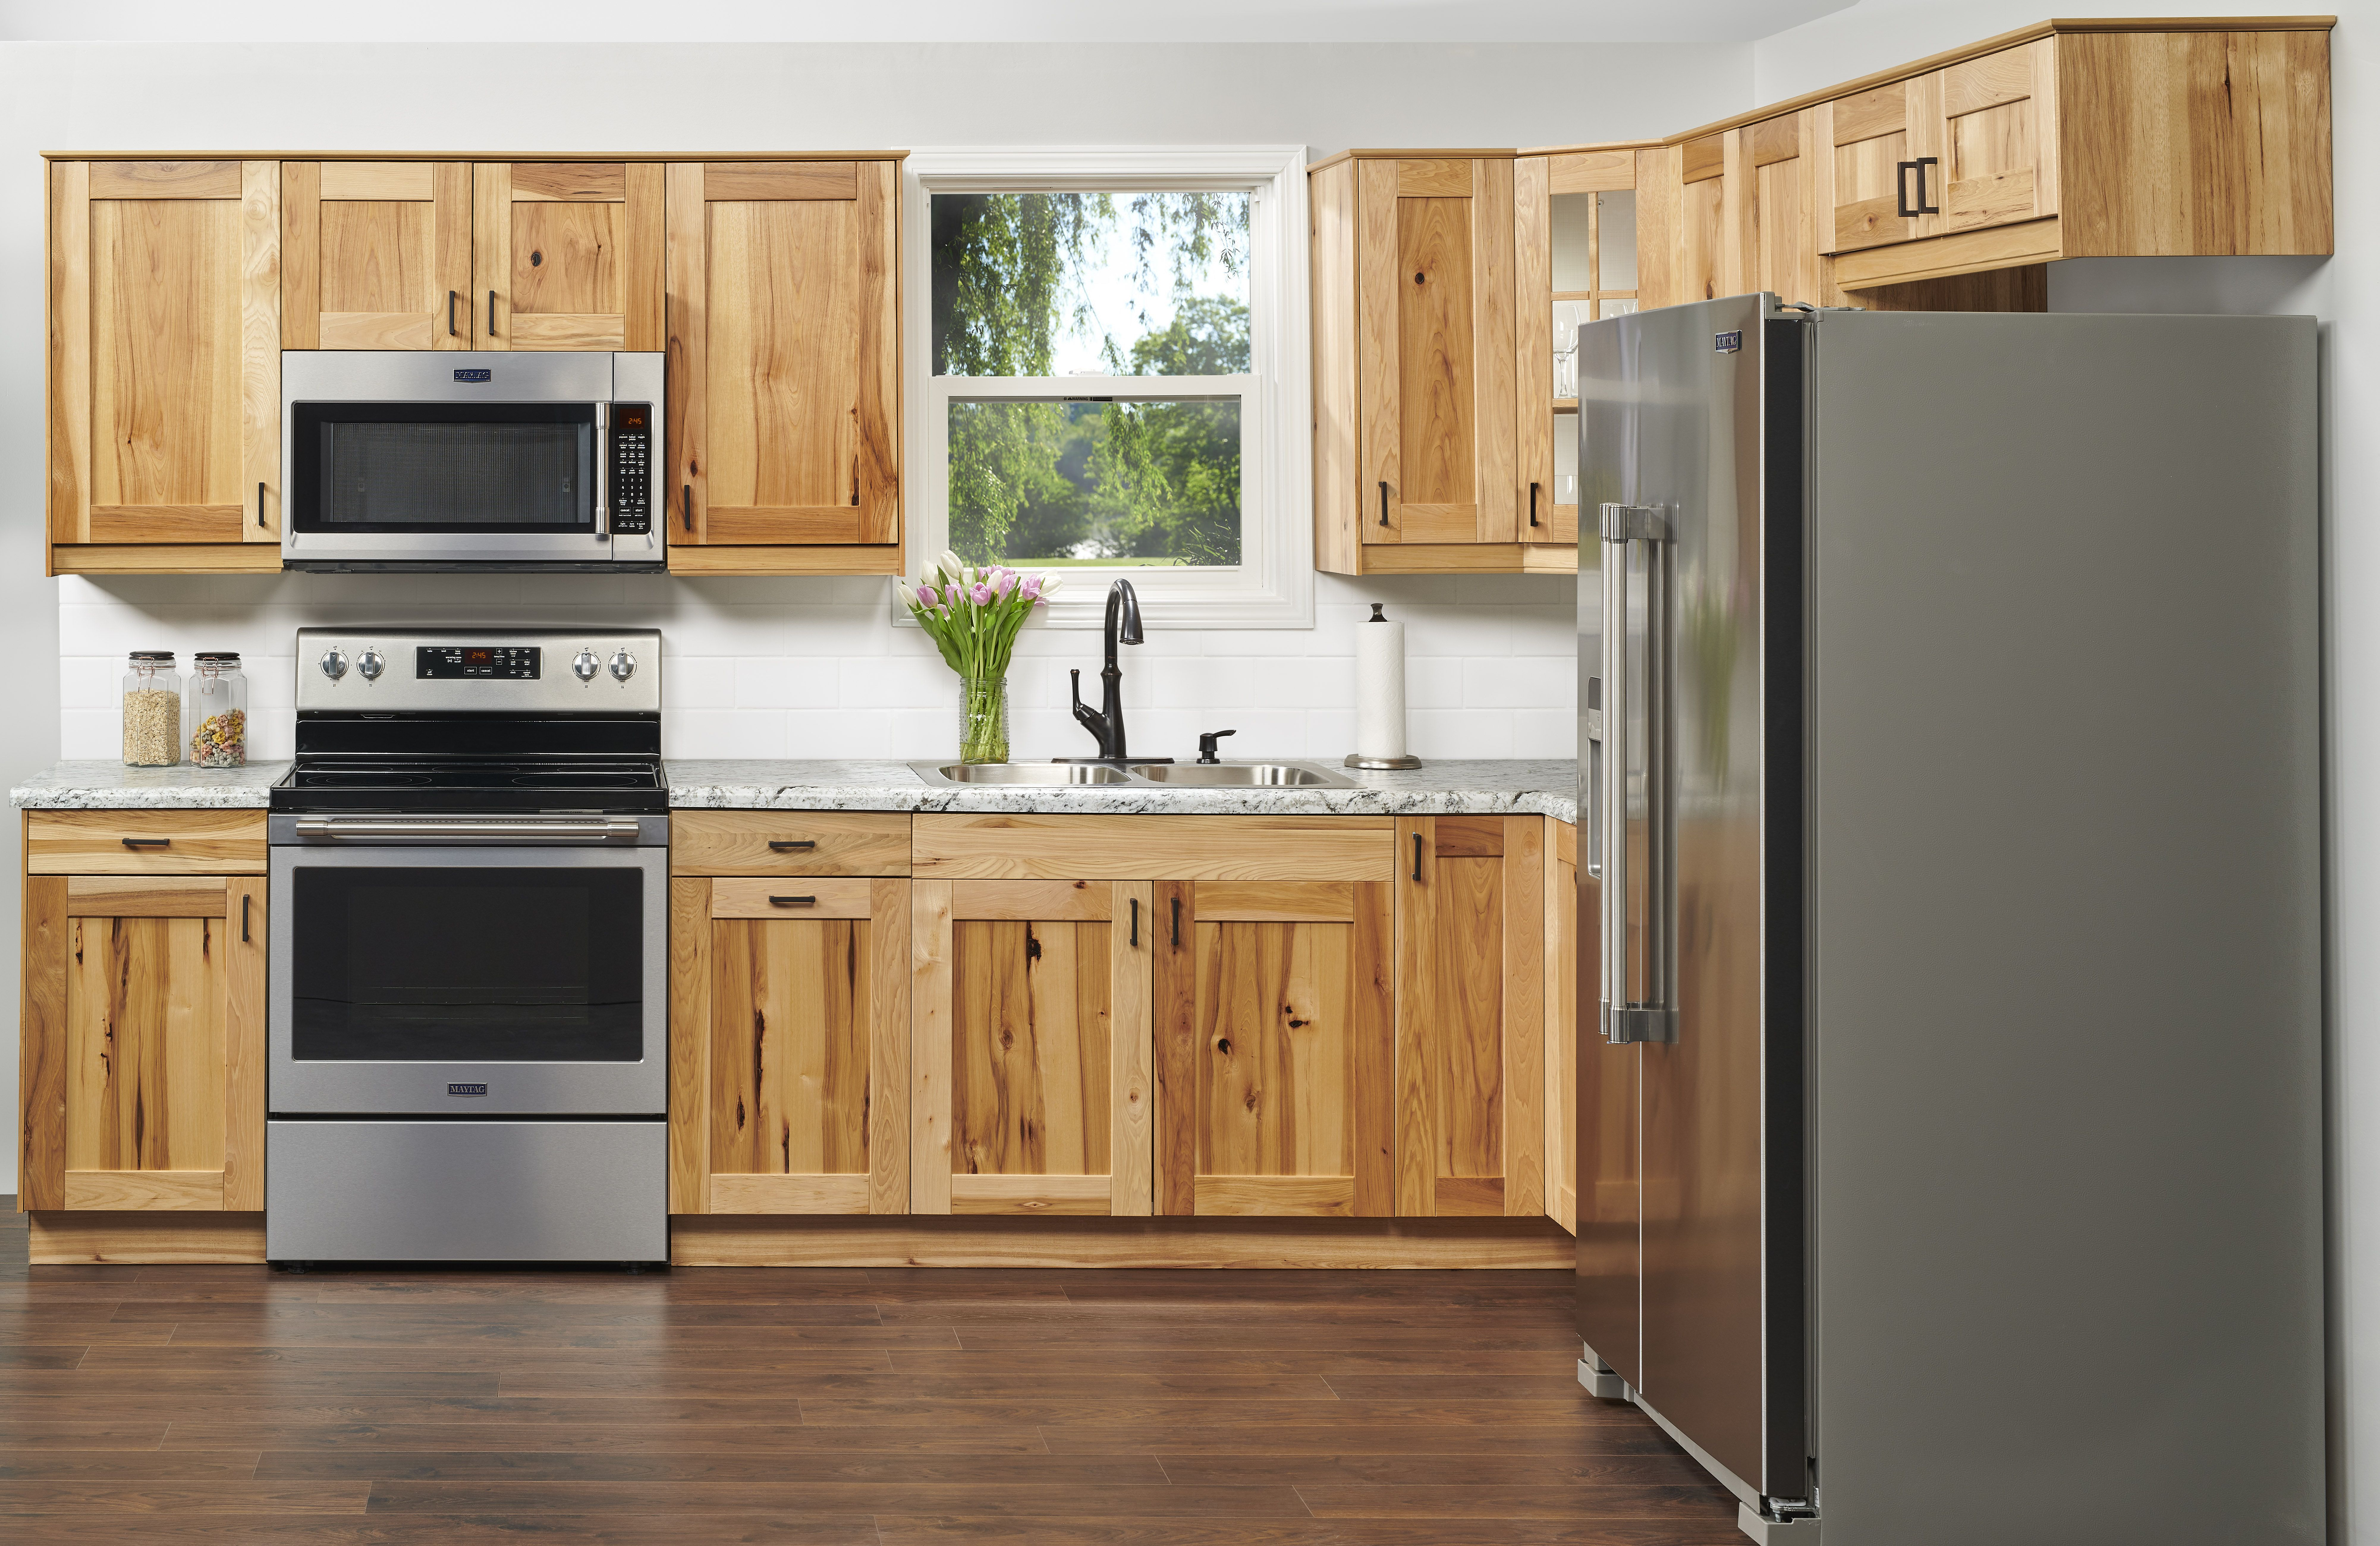 Travik Hickory Klearvue Cabinetry Hickory Kitchen Cabinets Hickory Cabinets Hickory Kitchen